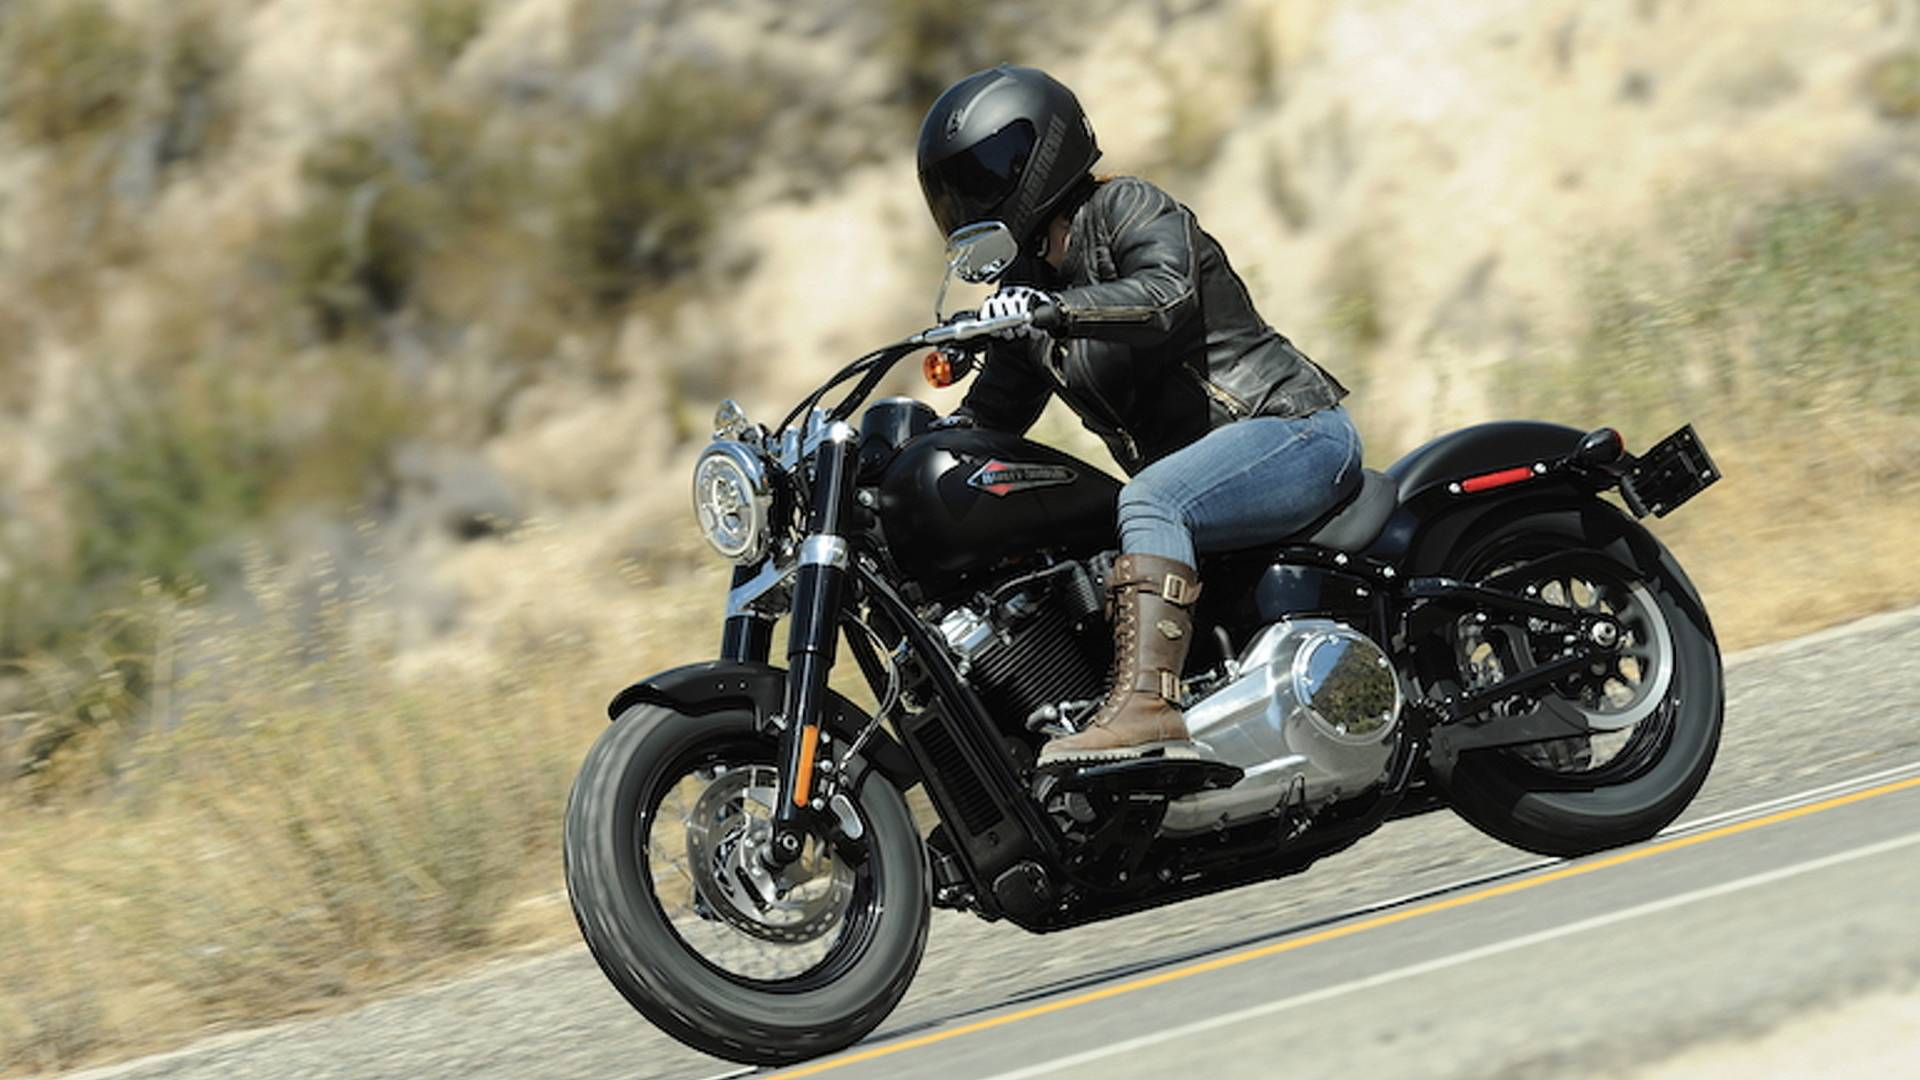 Harley Softail Slim >> First Ride 2018 Harley Davidson Softail Slim